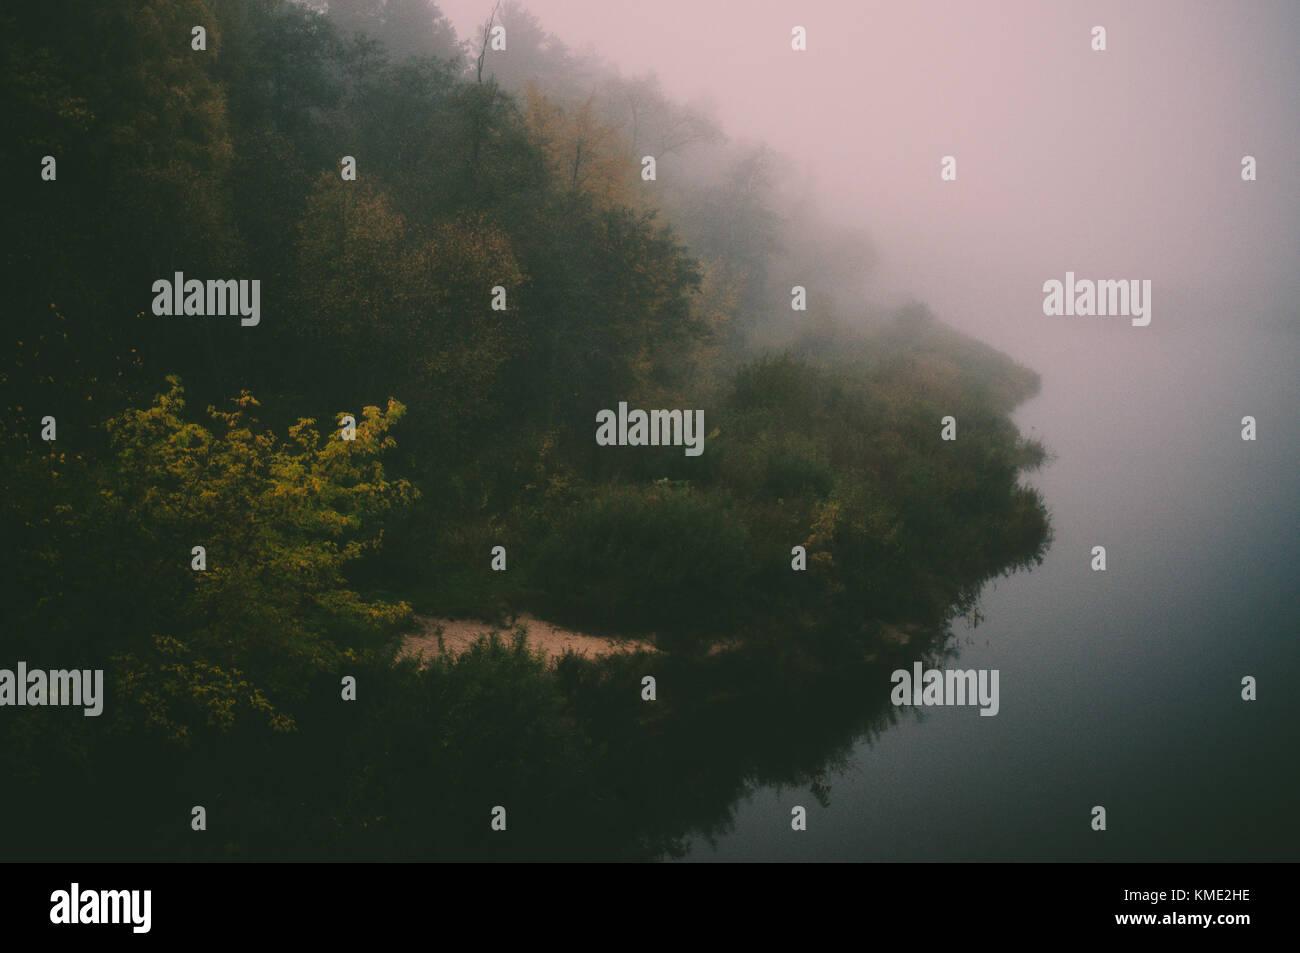 Misty morning on green island. Smoky mysterious landscape. - Stock Image